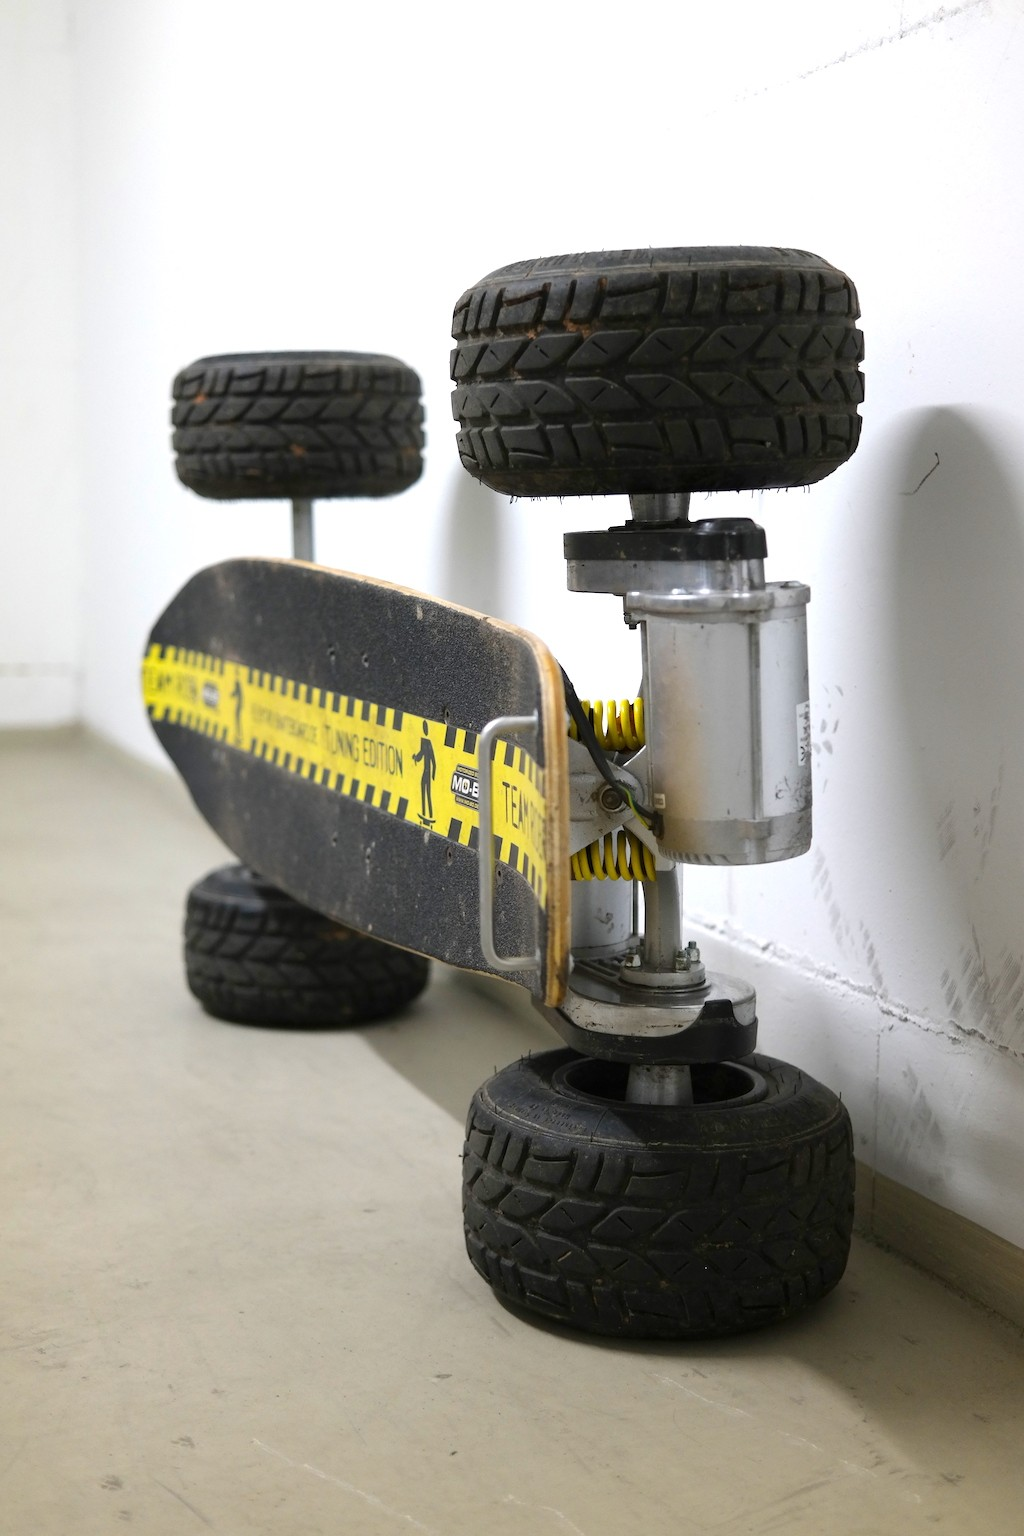 tuninggriff ersatzteile skatey elektro skateboards. Black Bedroom Furniture Sets. Home Design Ideas